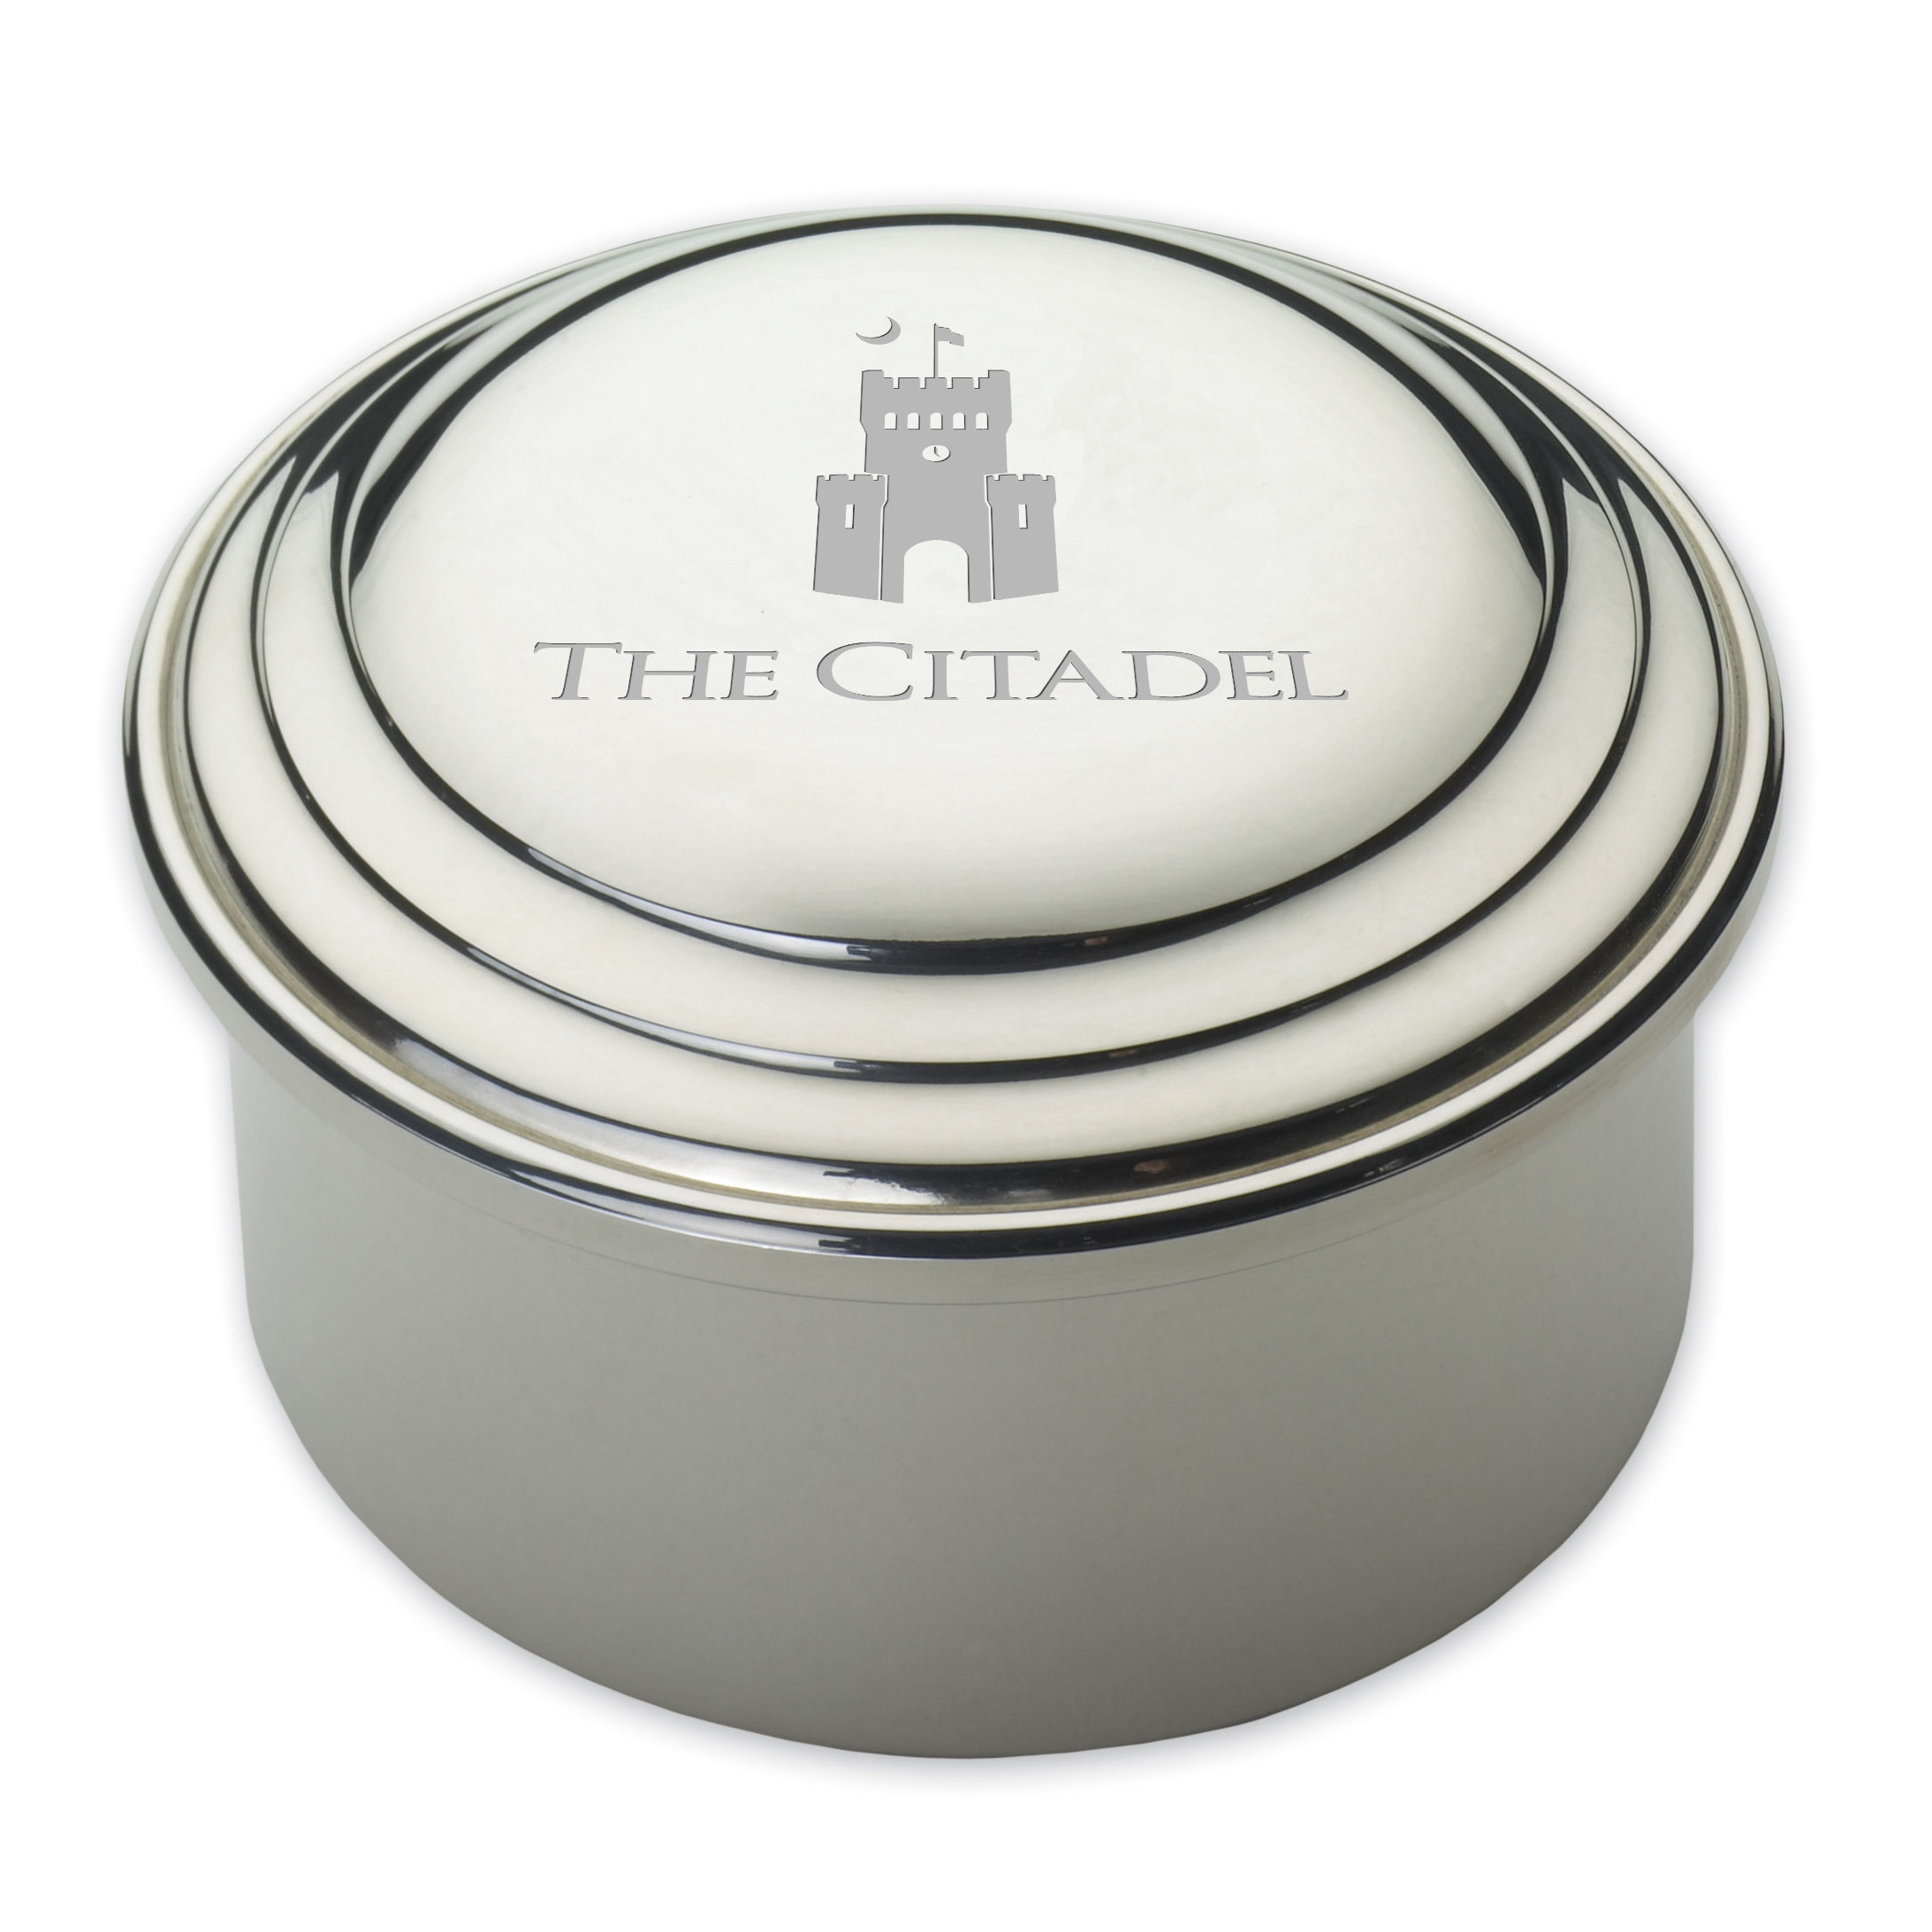 Citadel Pewter Keepsake Box